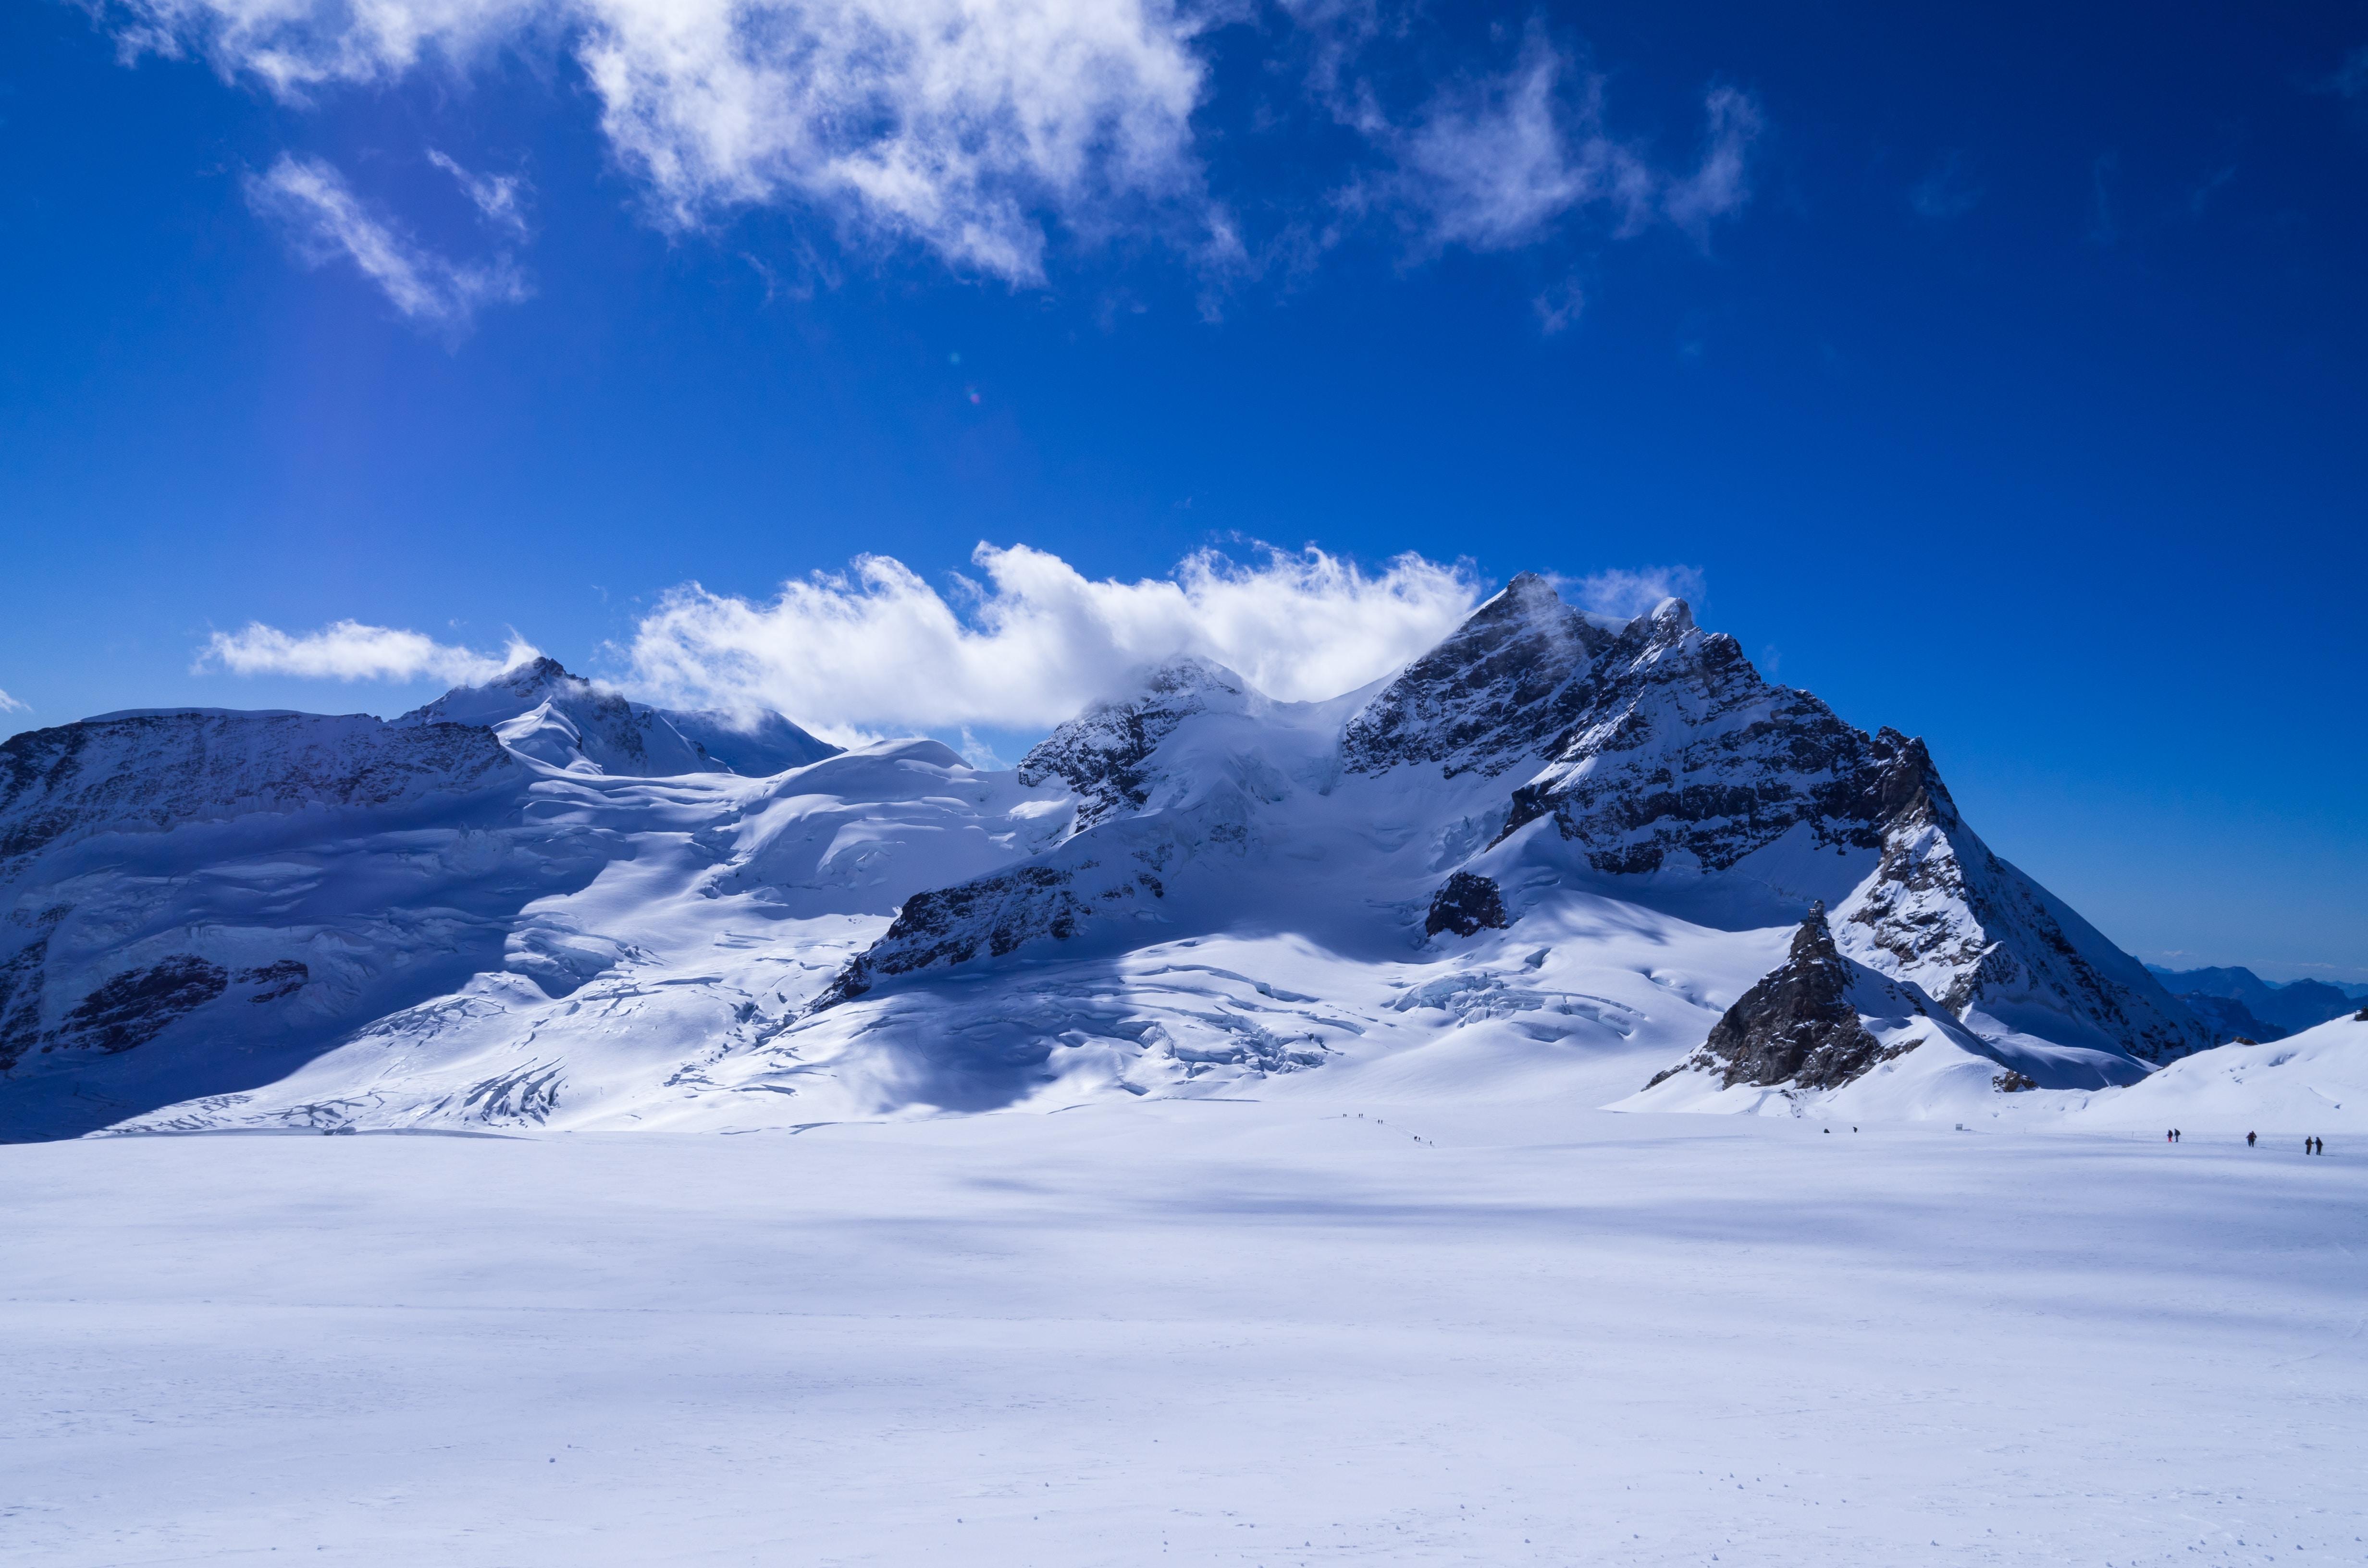 snow-covered mountain under calm blue sky